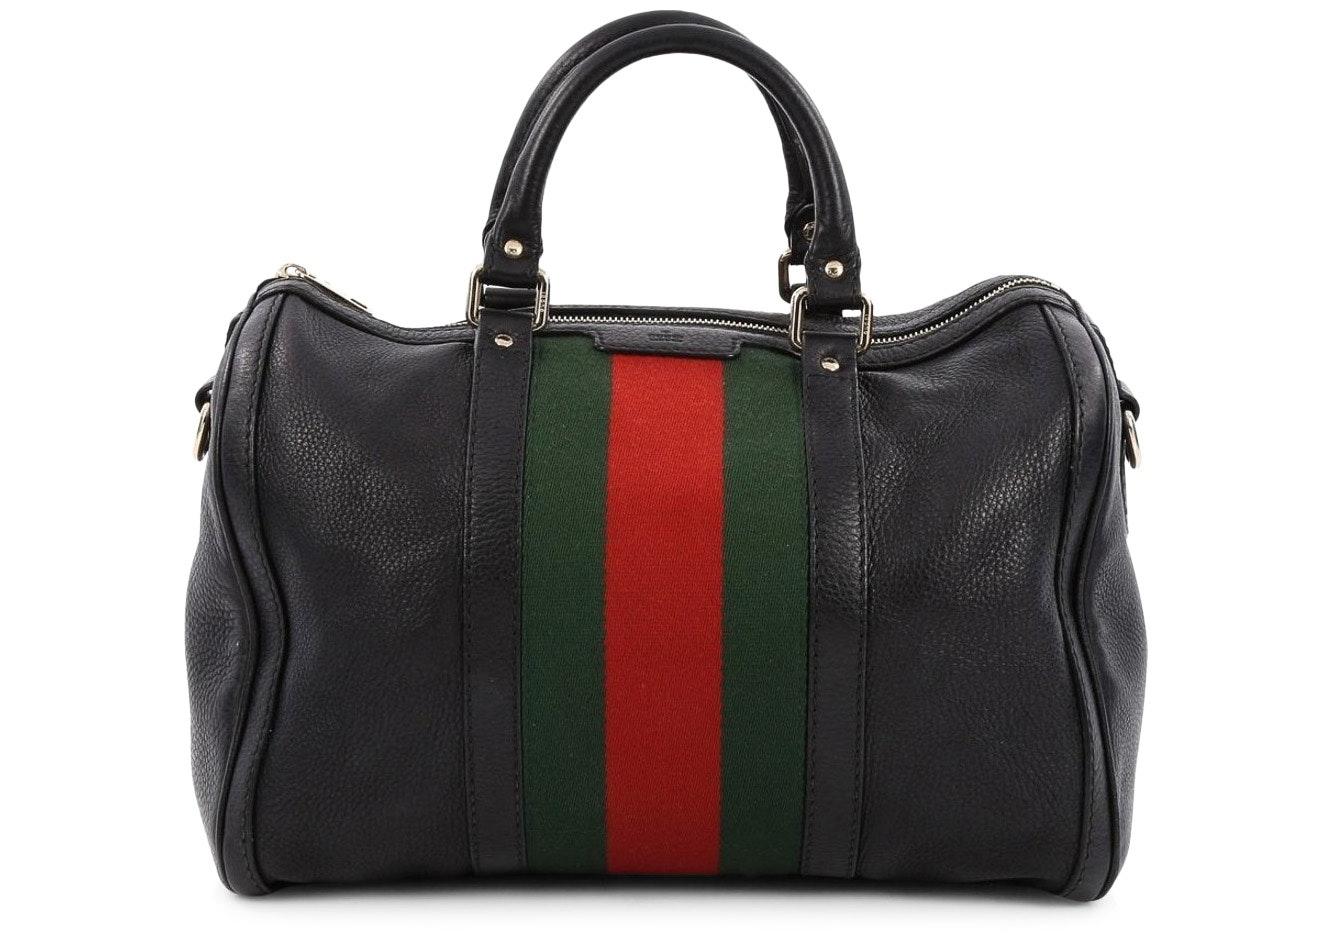 Gucci Vintage Web Boston Bag Satchel Medium Black